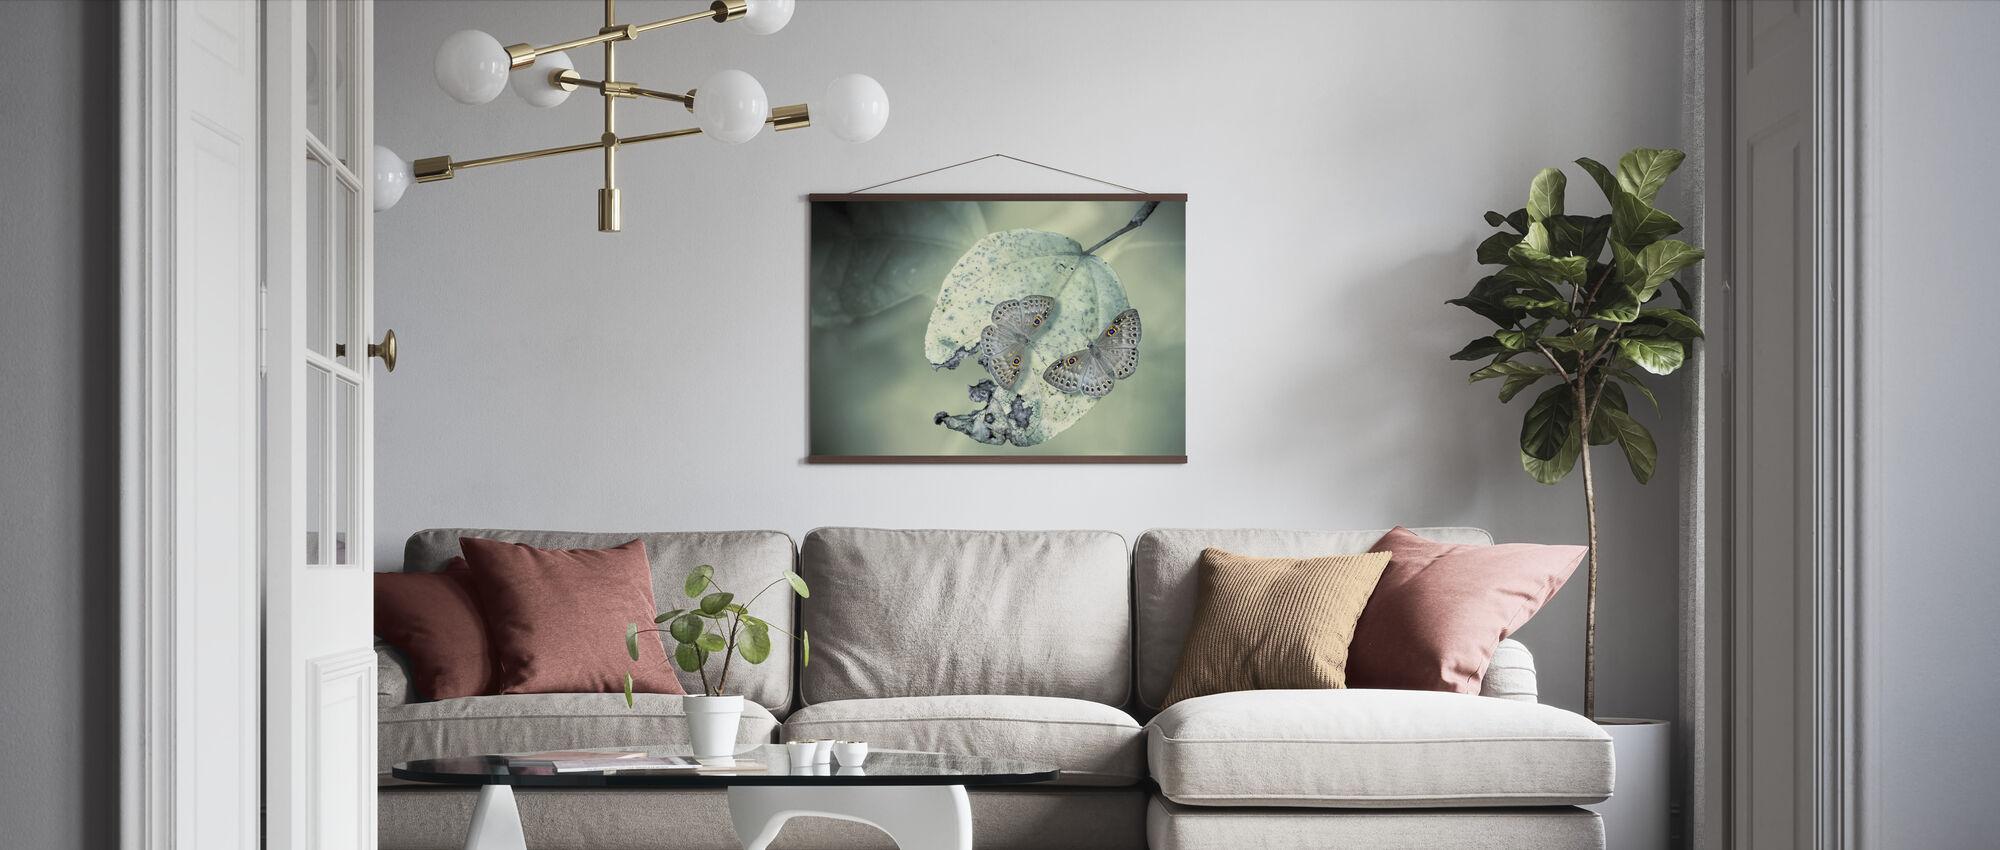 Duet - Poster - Living Room